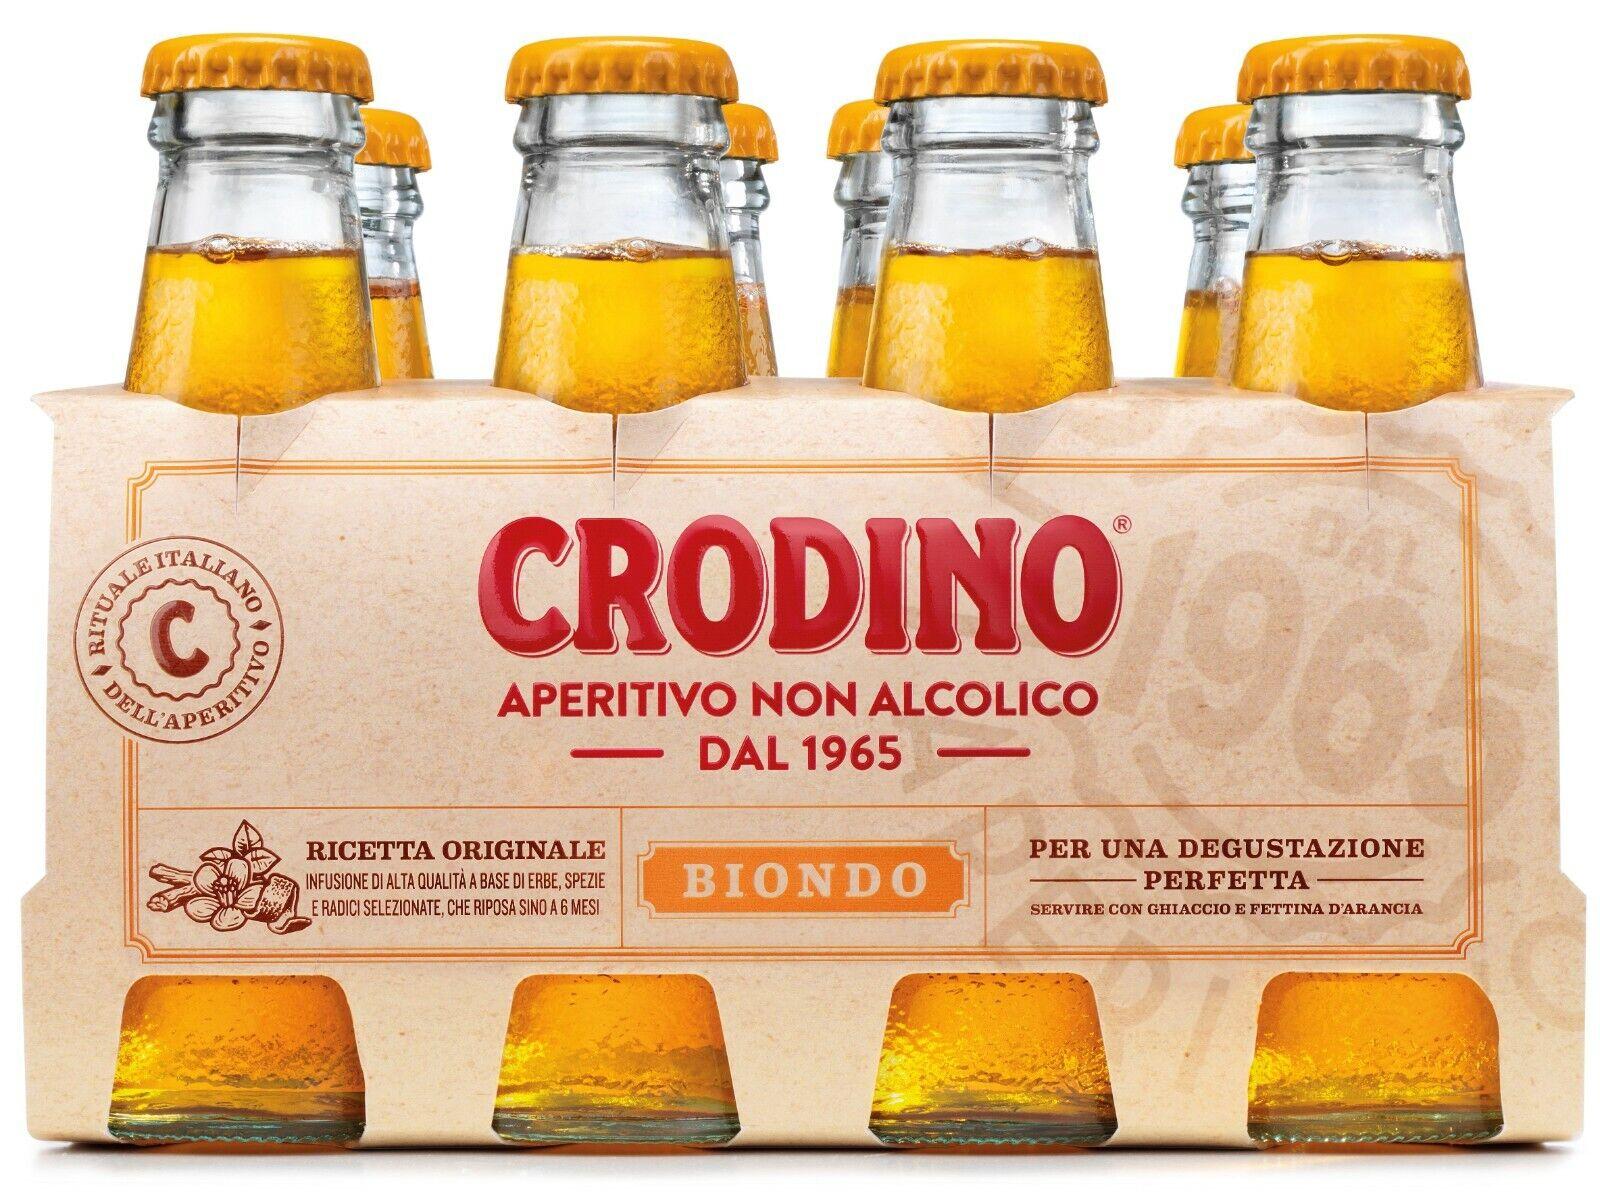 8 Flaschen Crodino Aperitivo 1965 Aperitif 9,8 cl alkoholfrei fertig gemixt